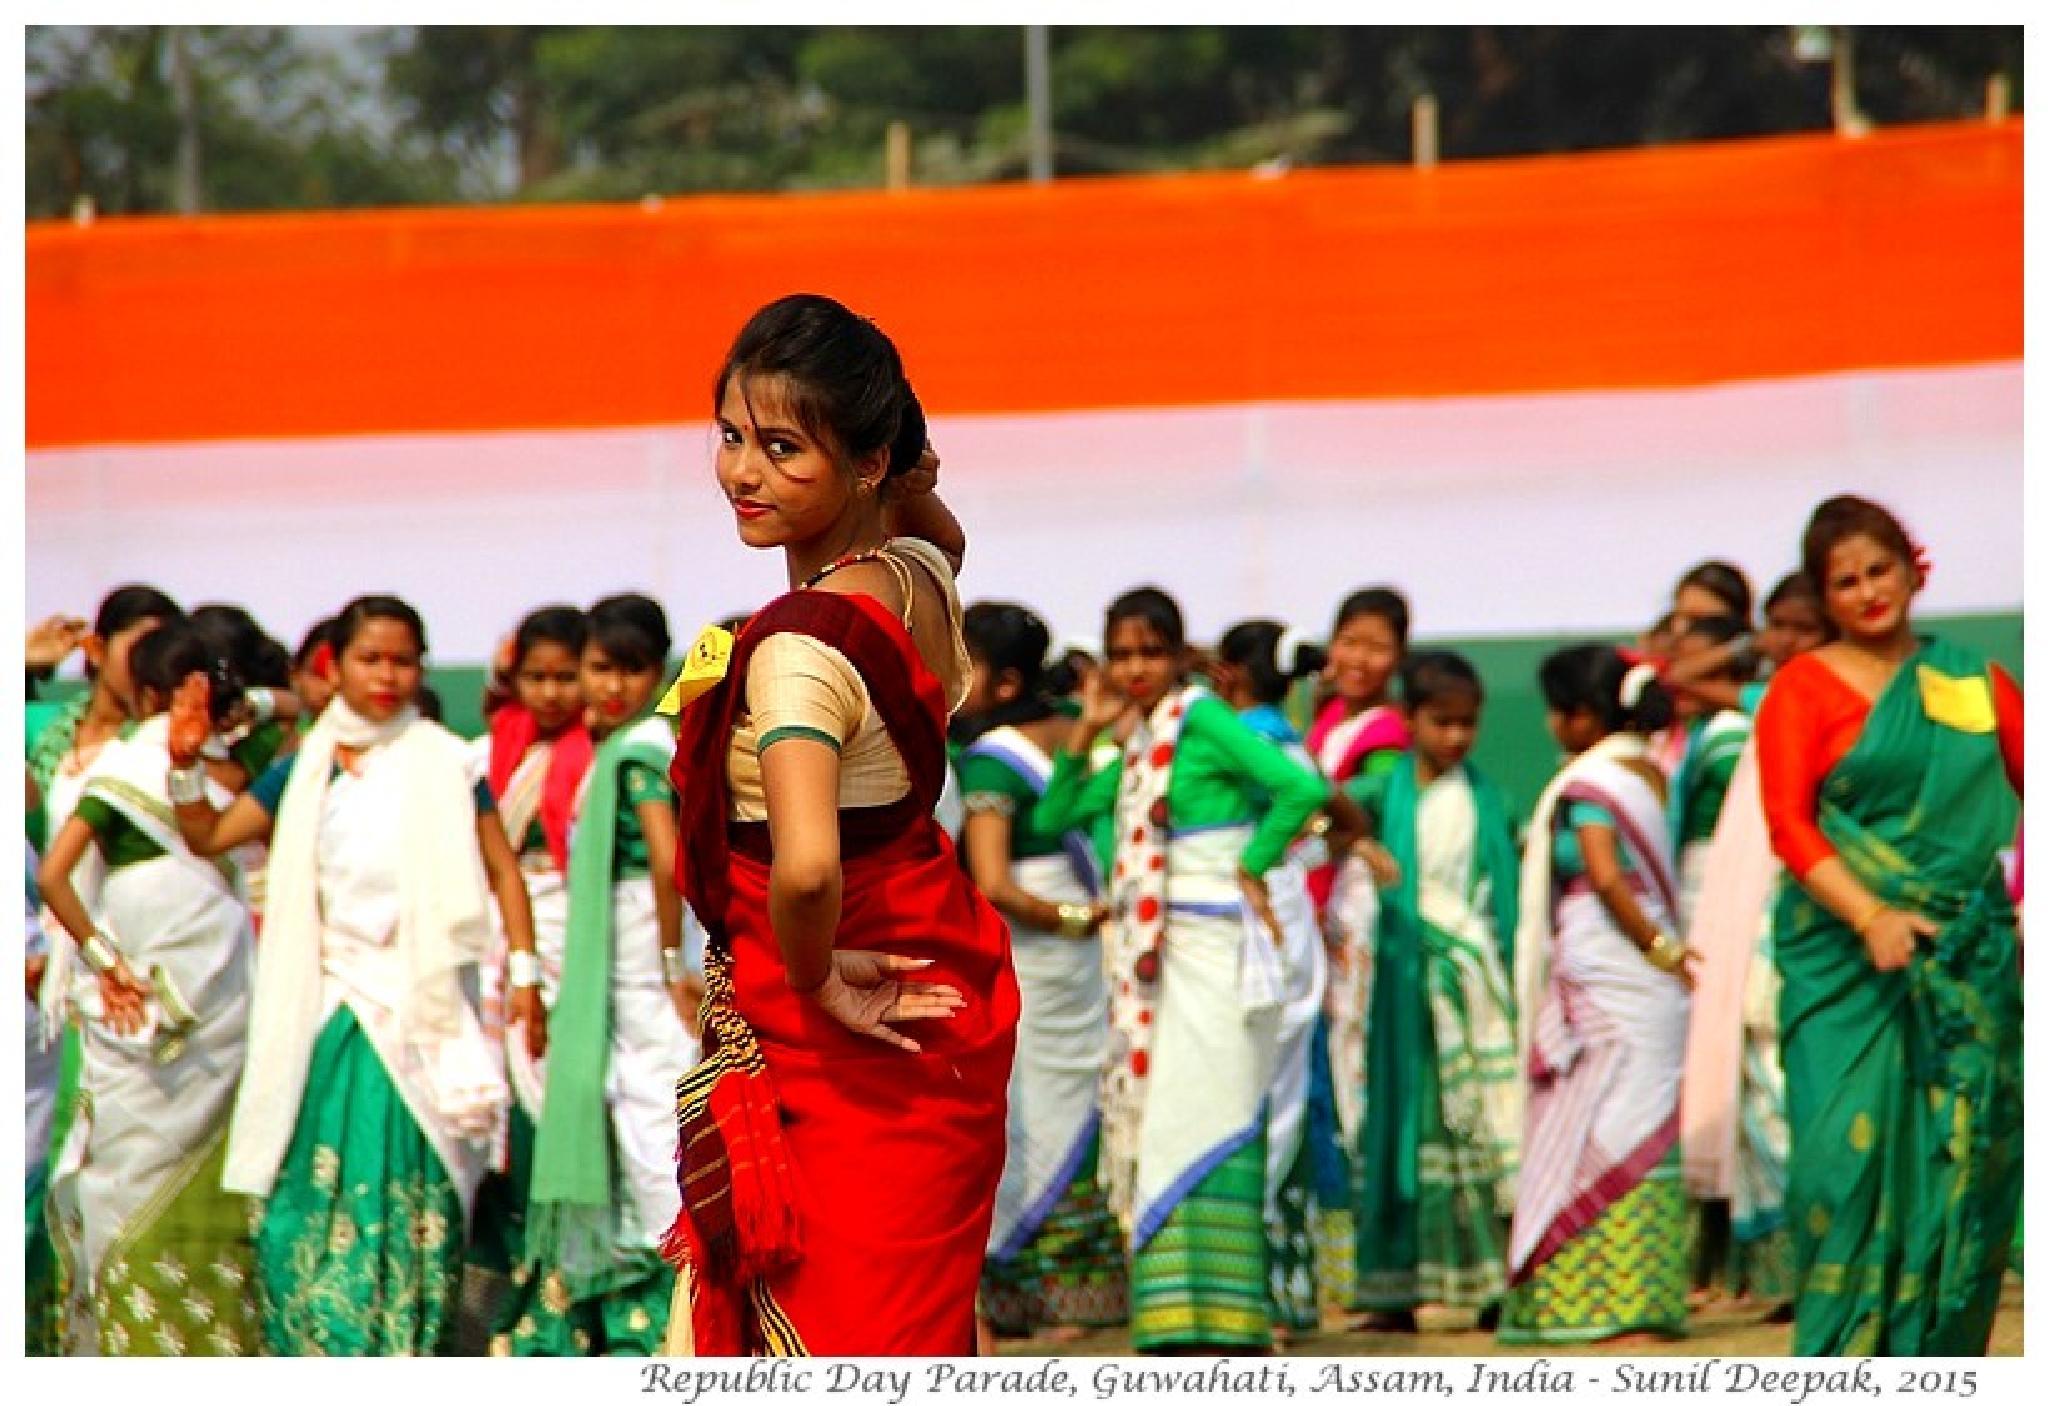 The girl who loved dancing by Dr Sunil Deepak